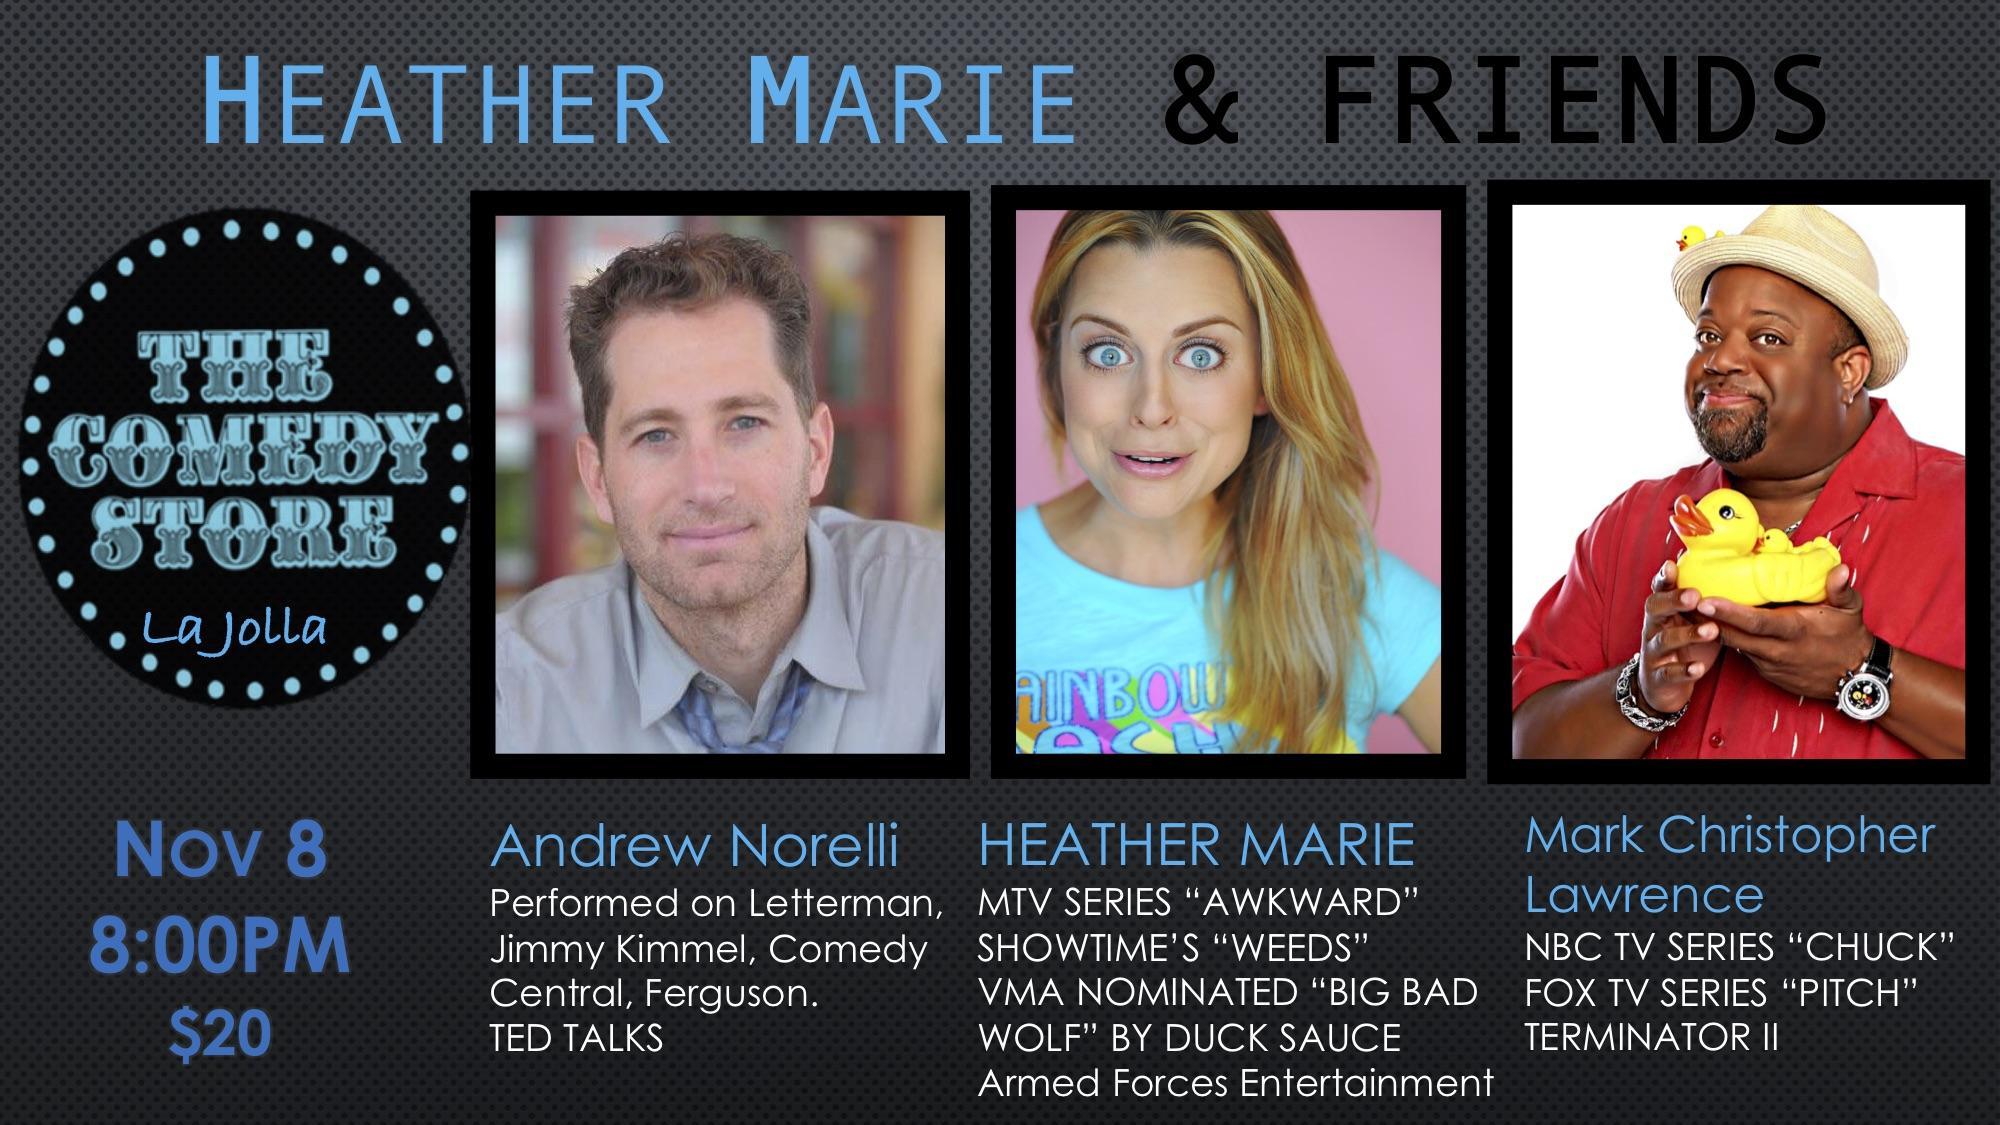 Heather Marie & Friends - Thursday - 8 pm Showtime